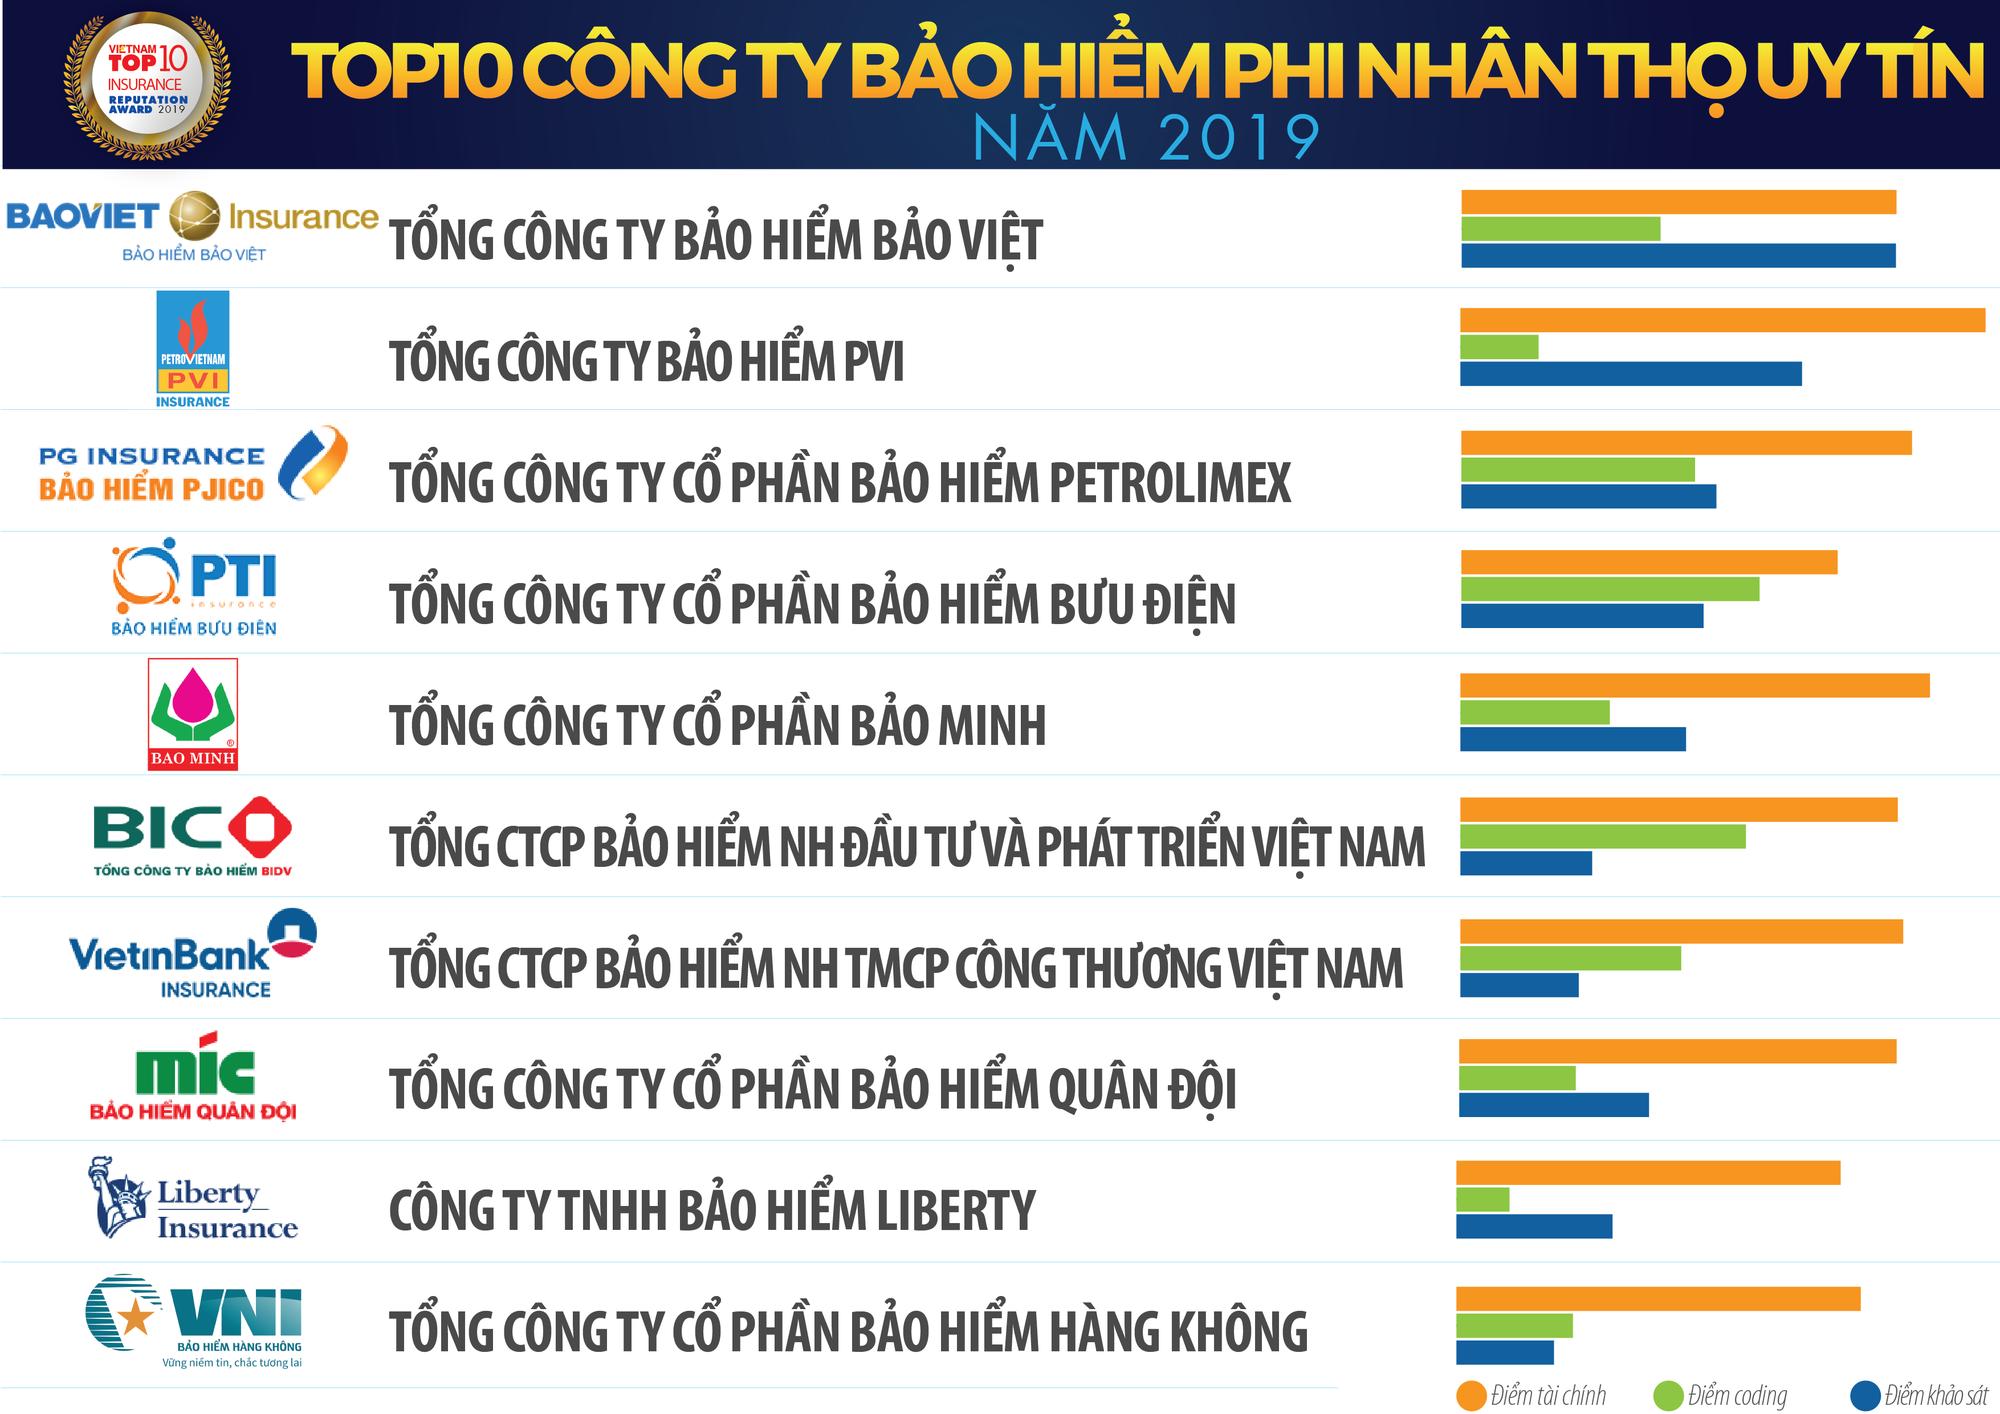 2-danh-sach-2-top-10-bh (1)